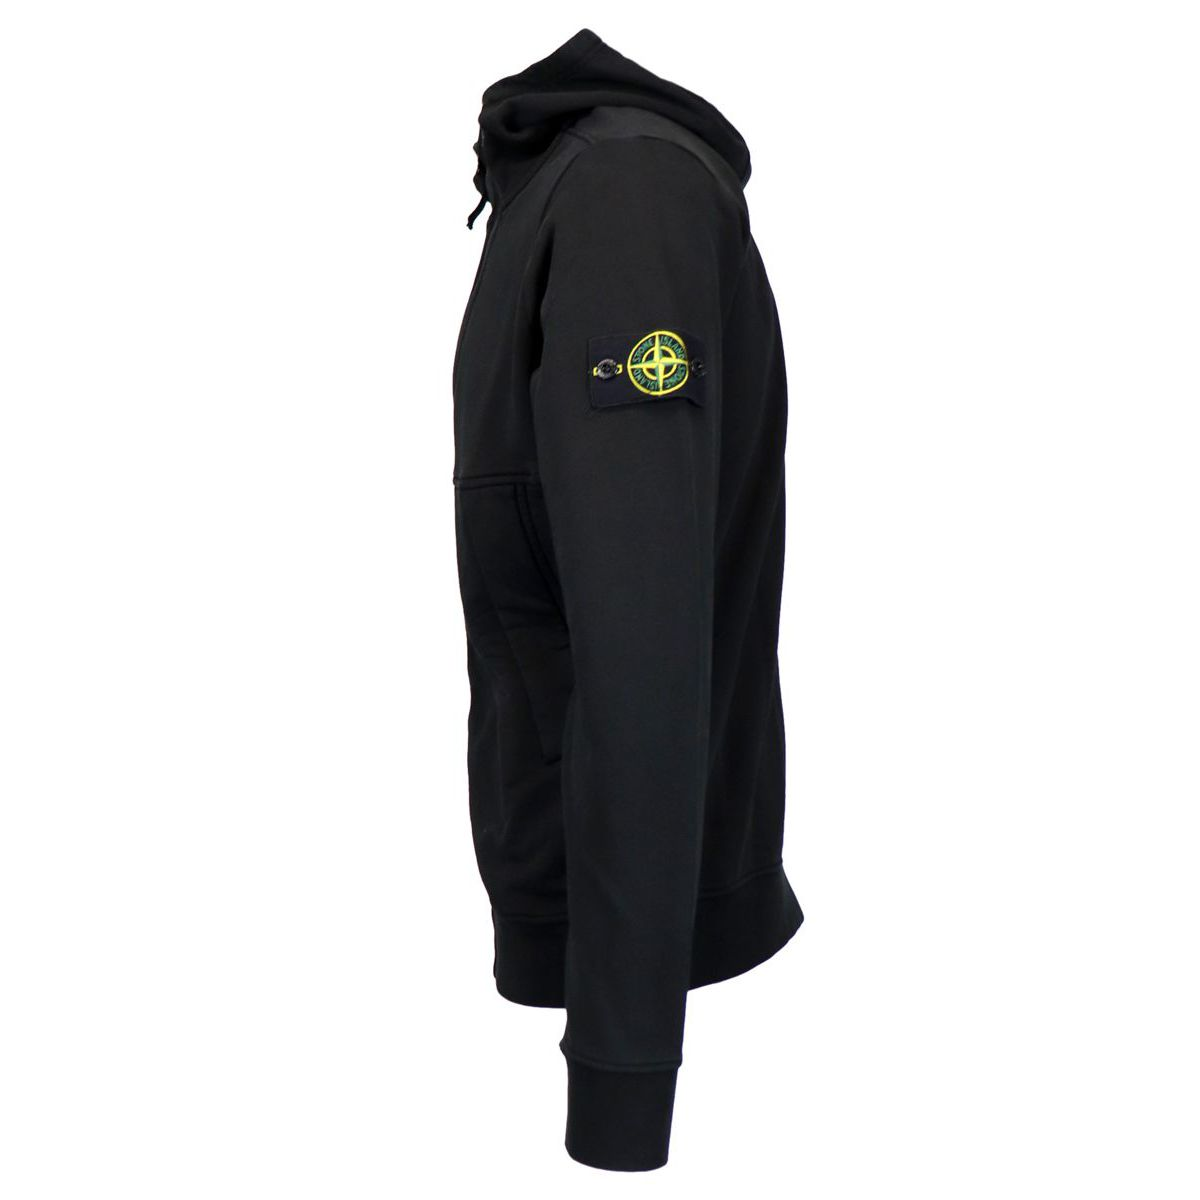 Full zip cotton sweatshirt with hood Black Stone Island